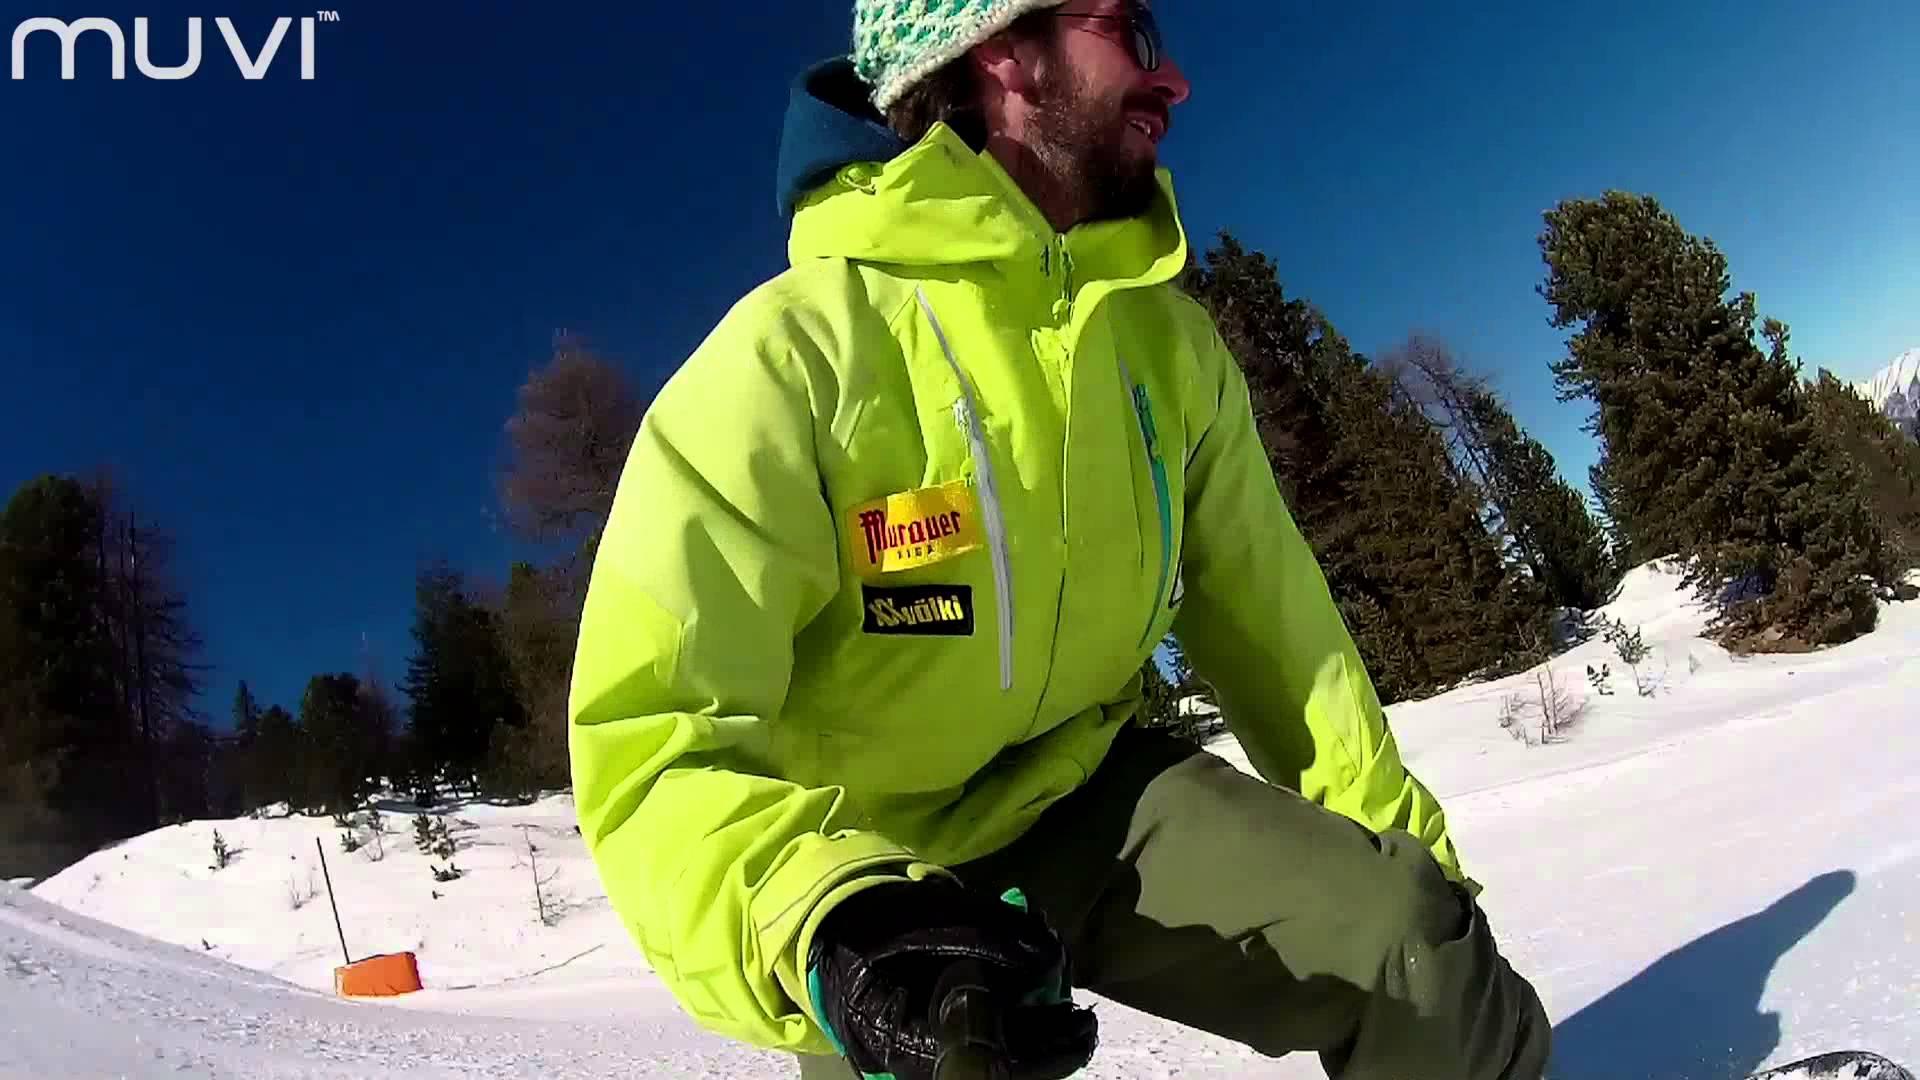 Veho MUVI K-Series – Snowboarding Selfie: Kreischberg, Austria